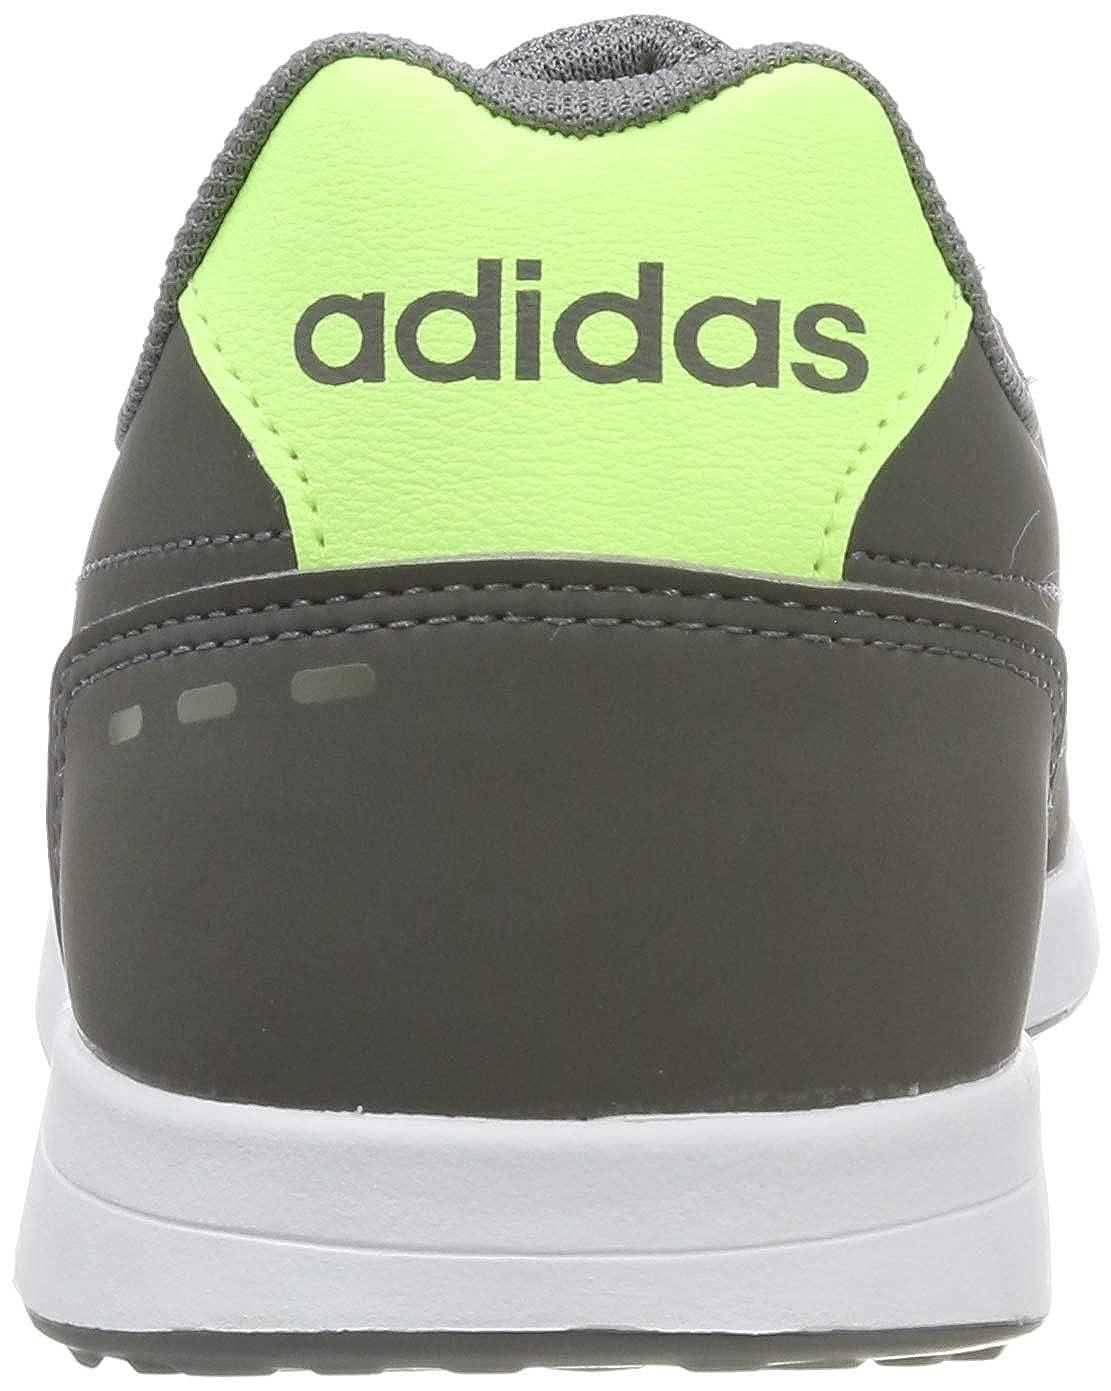 adidas Unisex Erwachsene Vs Switch 2 K Fitnessschuhe: Amazon